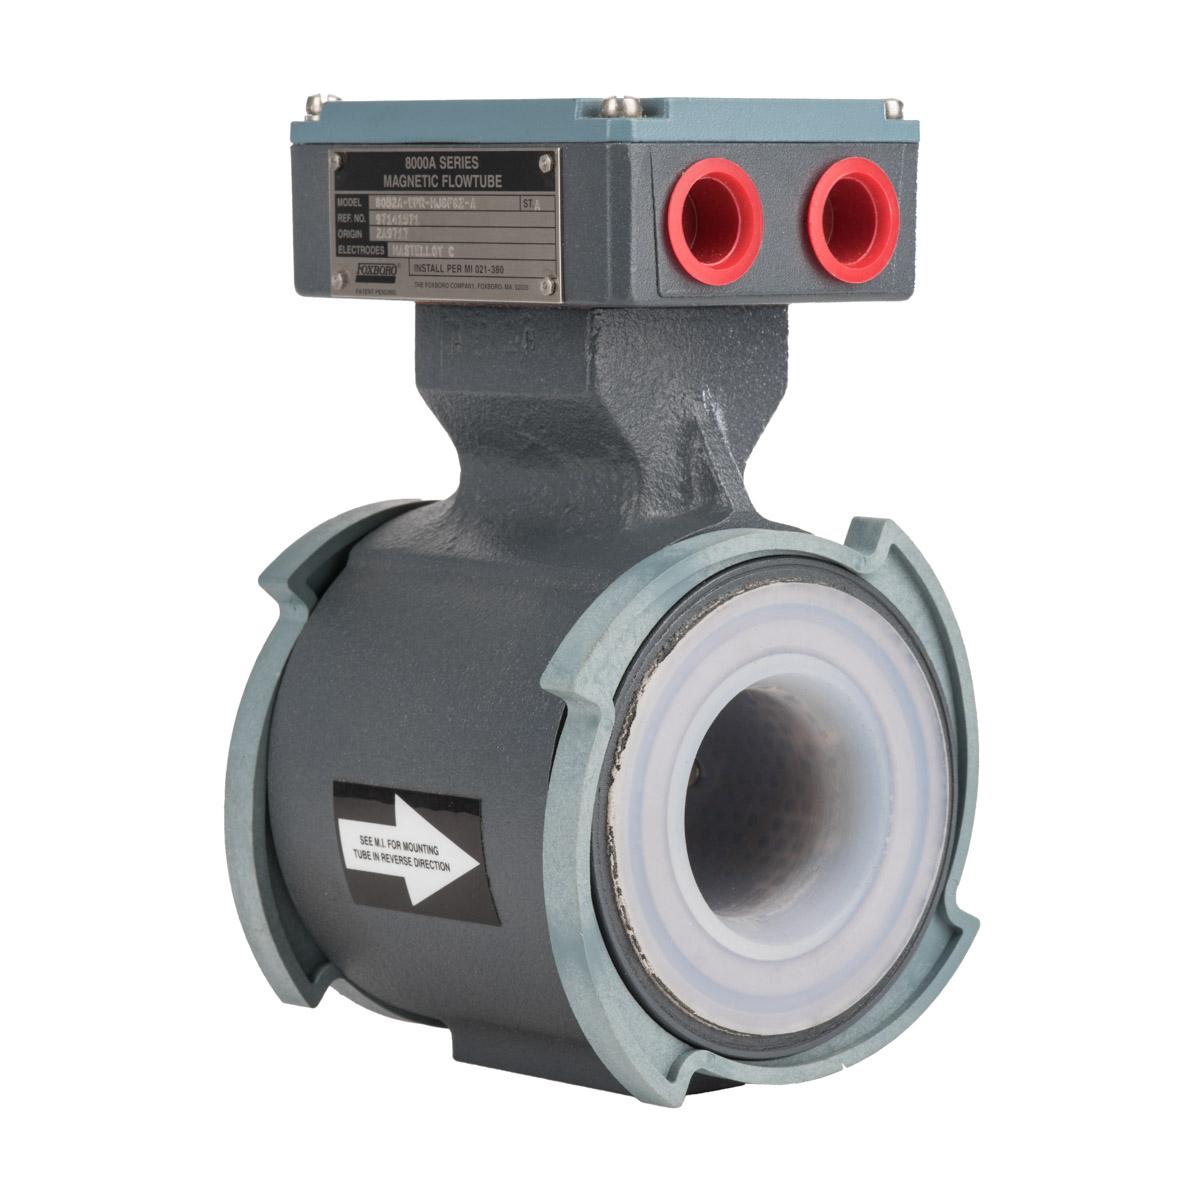 Foxboro 8000A Magnetic Flowtube